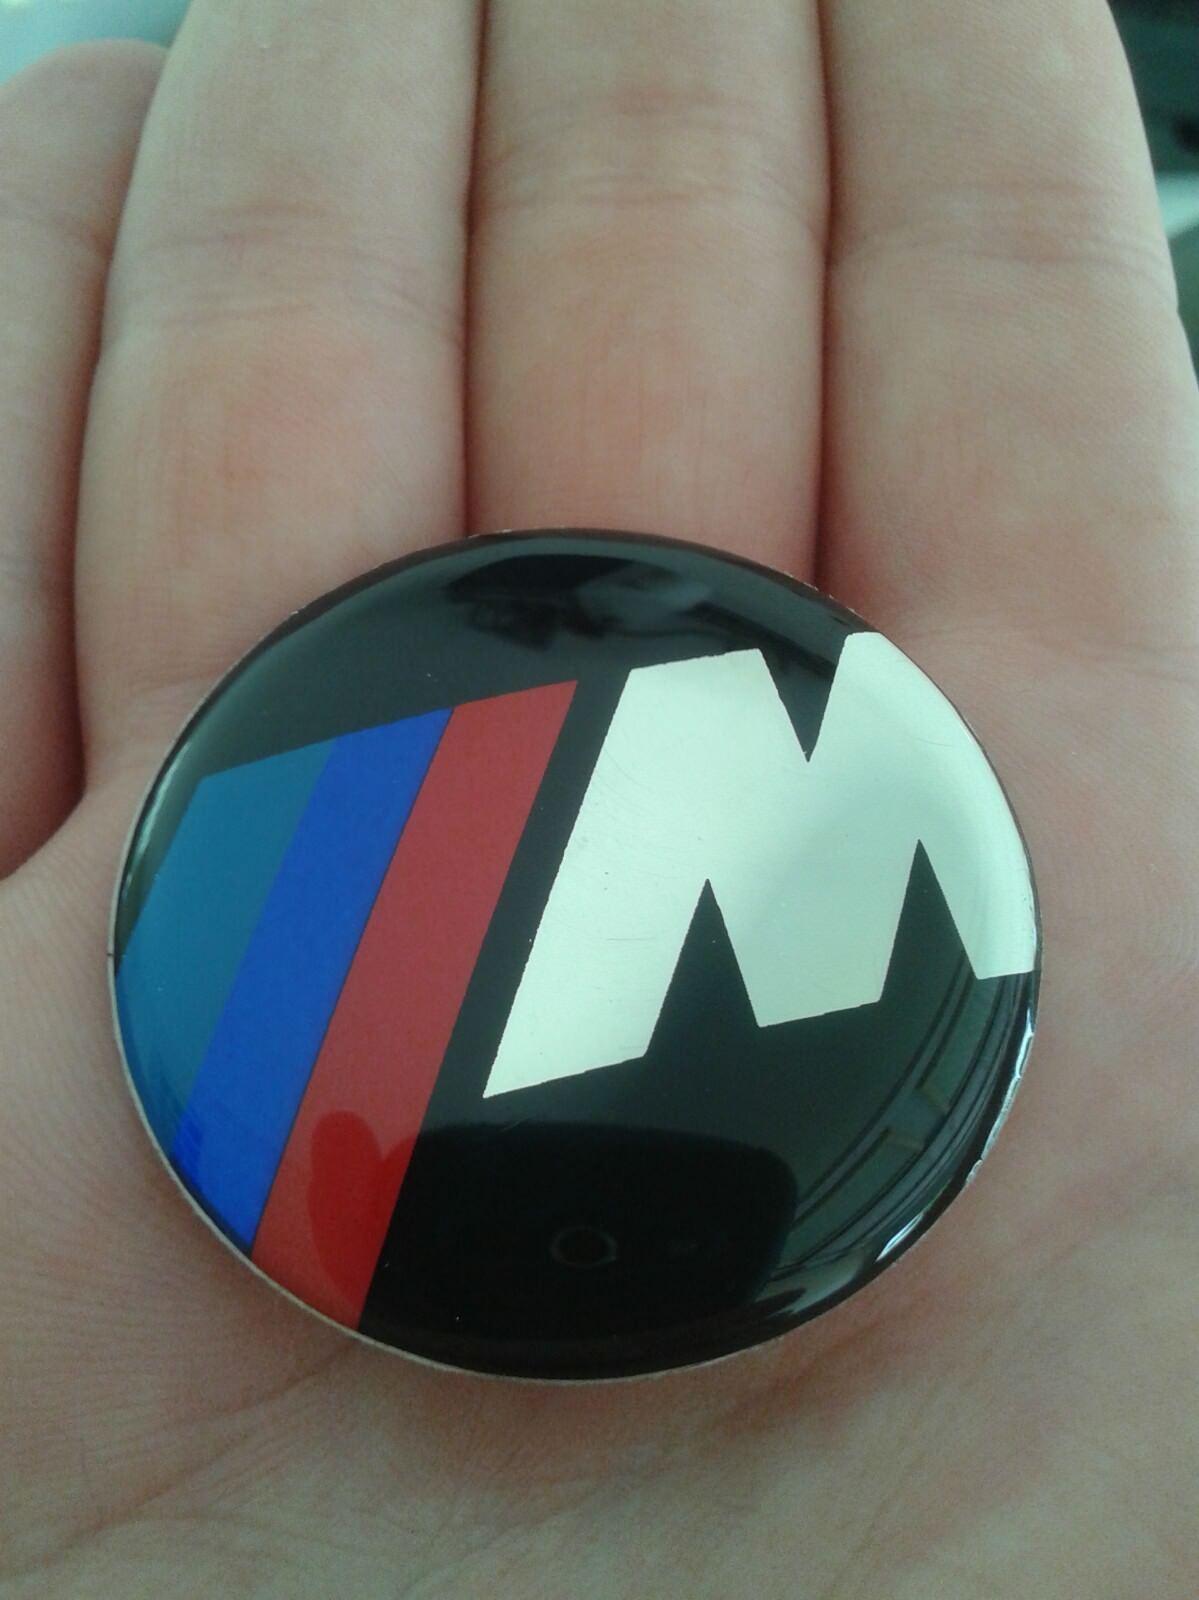 Bmw M Power Steering Wheel Badge Emblem Sticker Logo 45mm For Sale